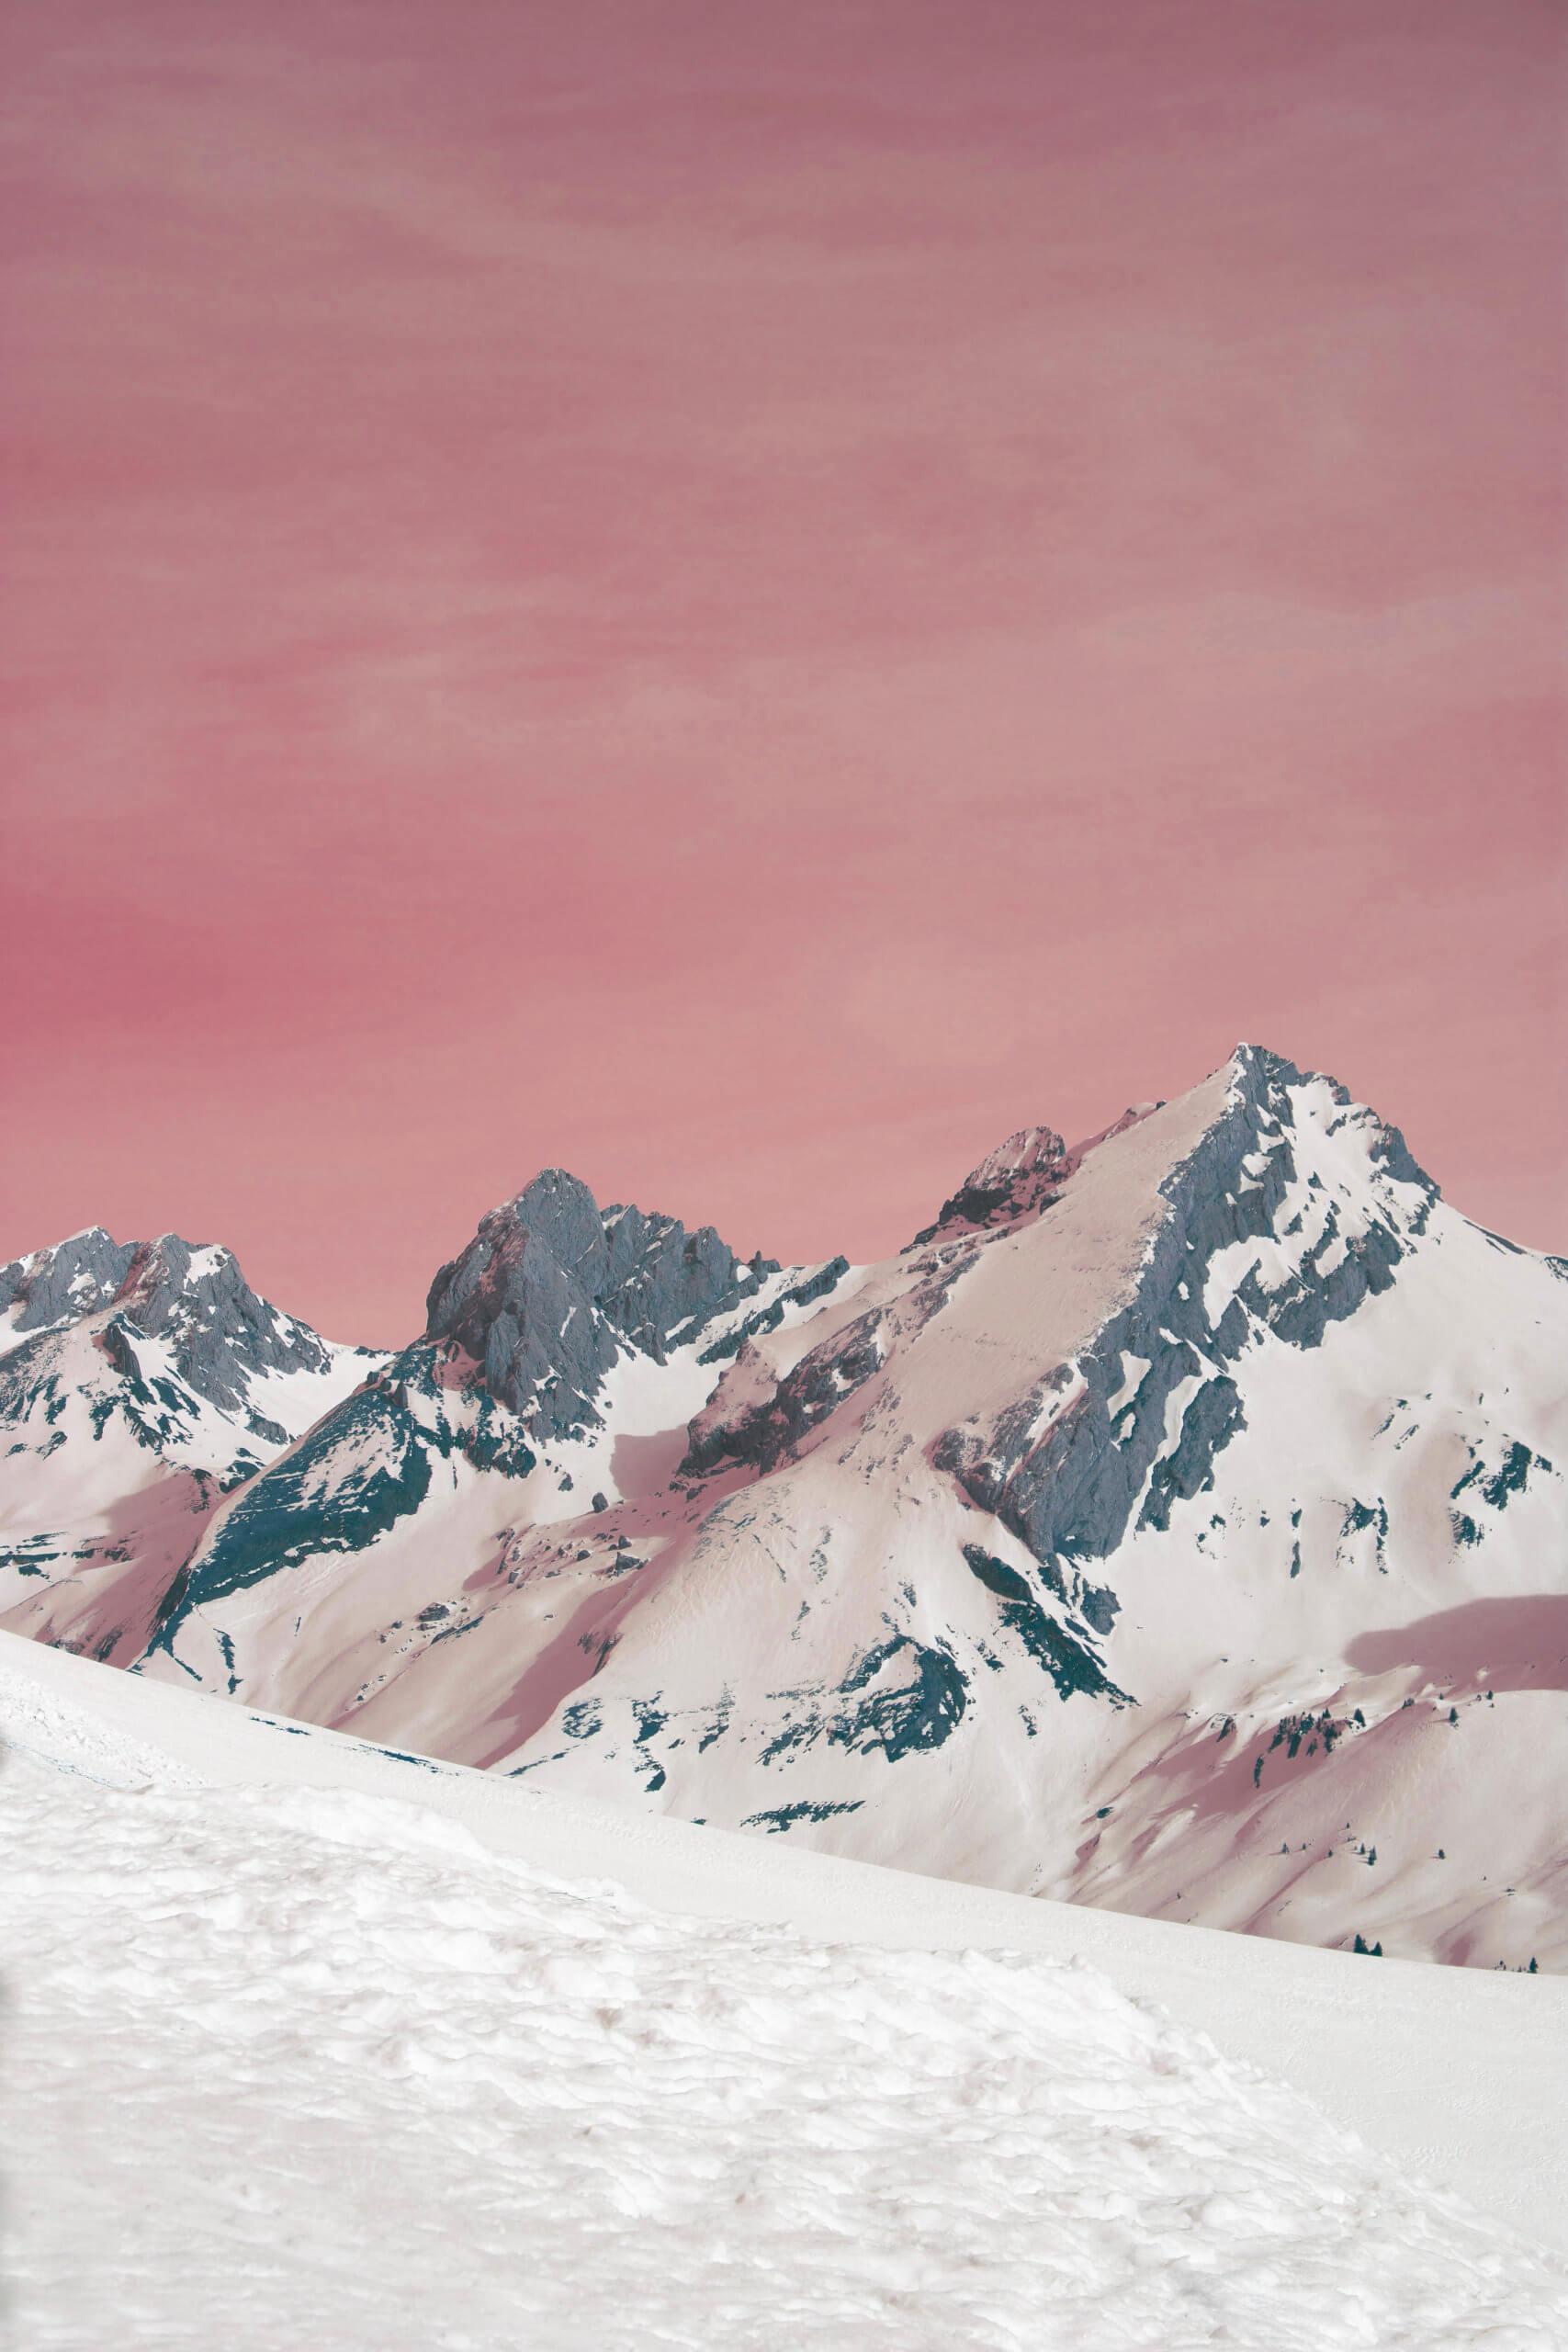 charlotte-pilat-altitude-02